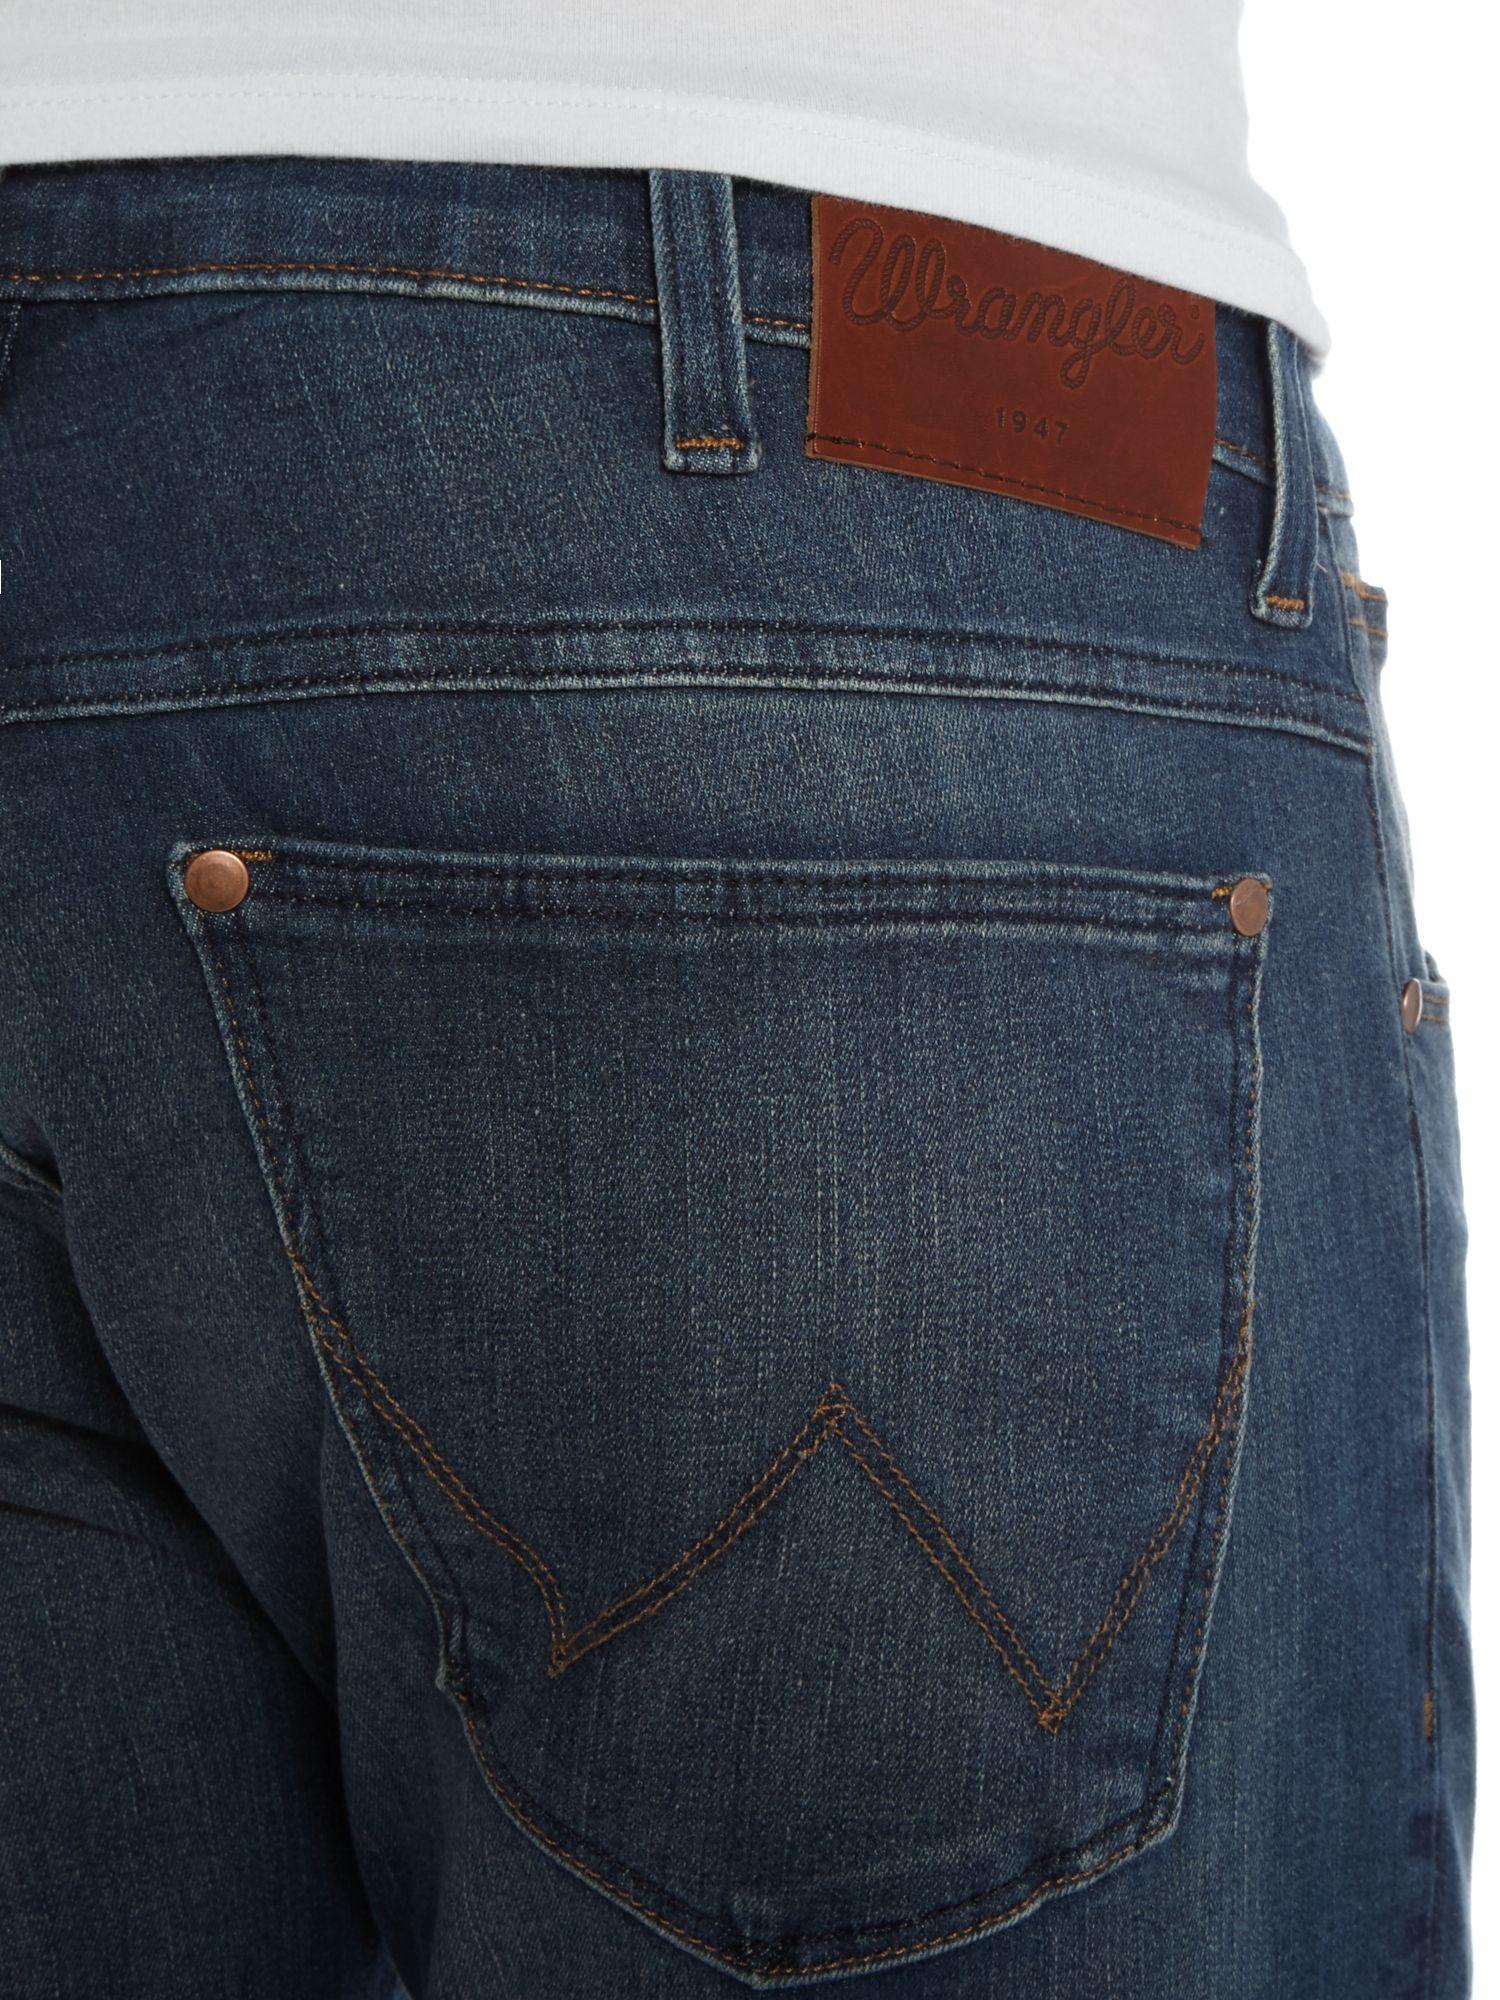 Wrangler Denim Bryson Mad Skinny Fit Mid Wash Jeans in Denim Mid Wash (Blue) for Men